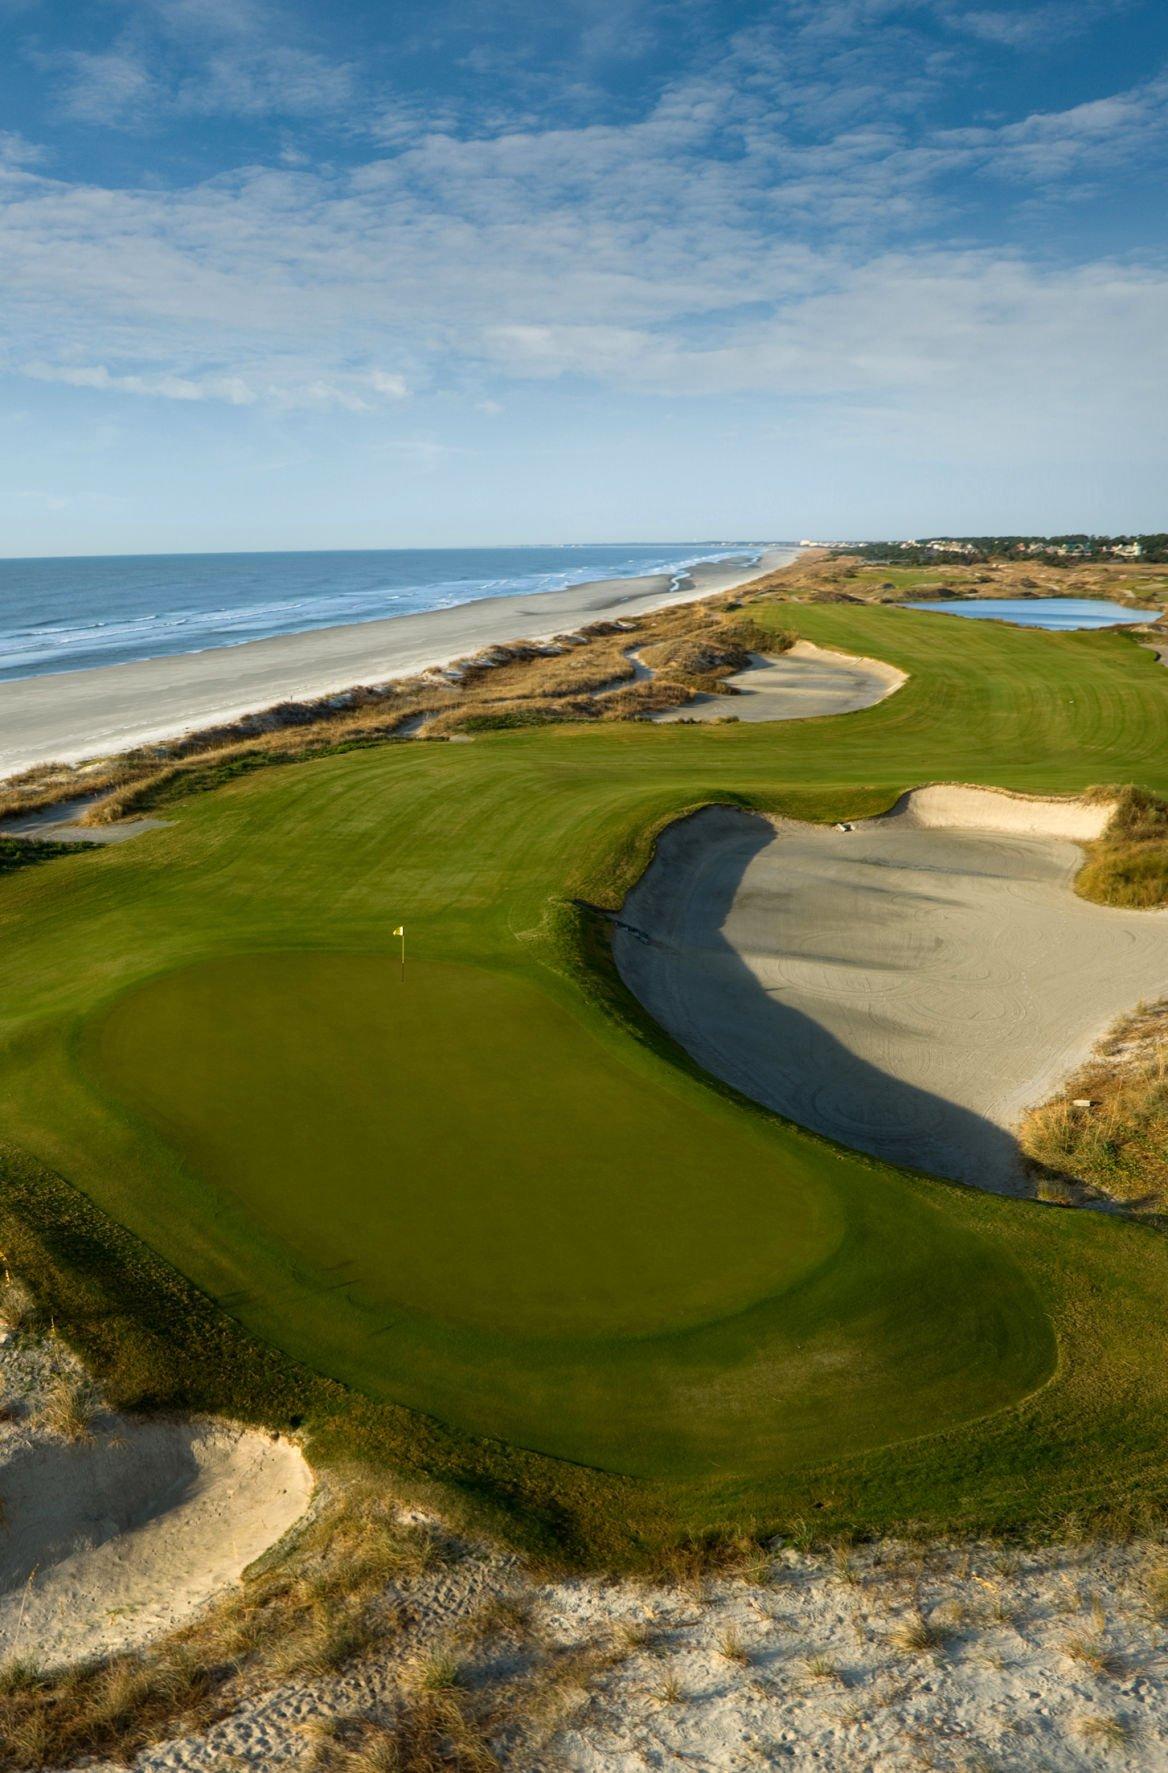 Ocean Course closes for final PGA preparations